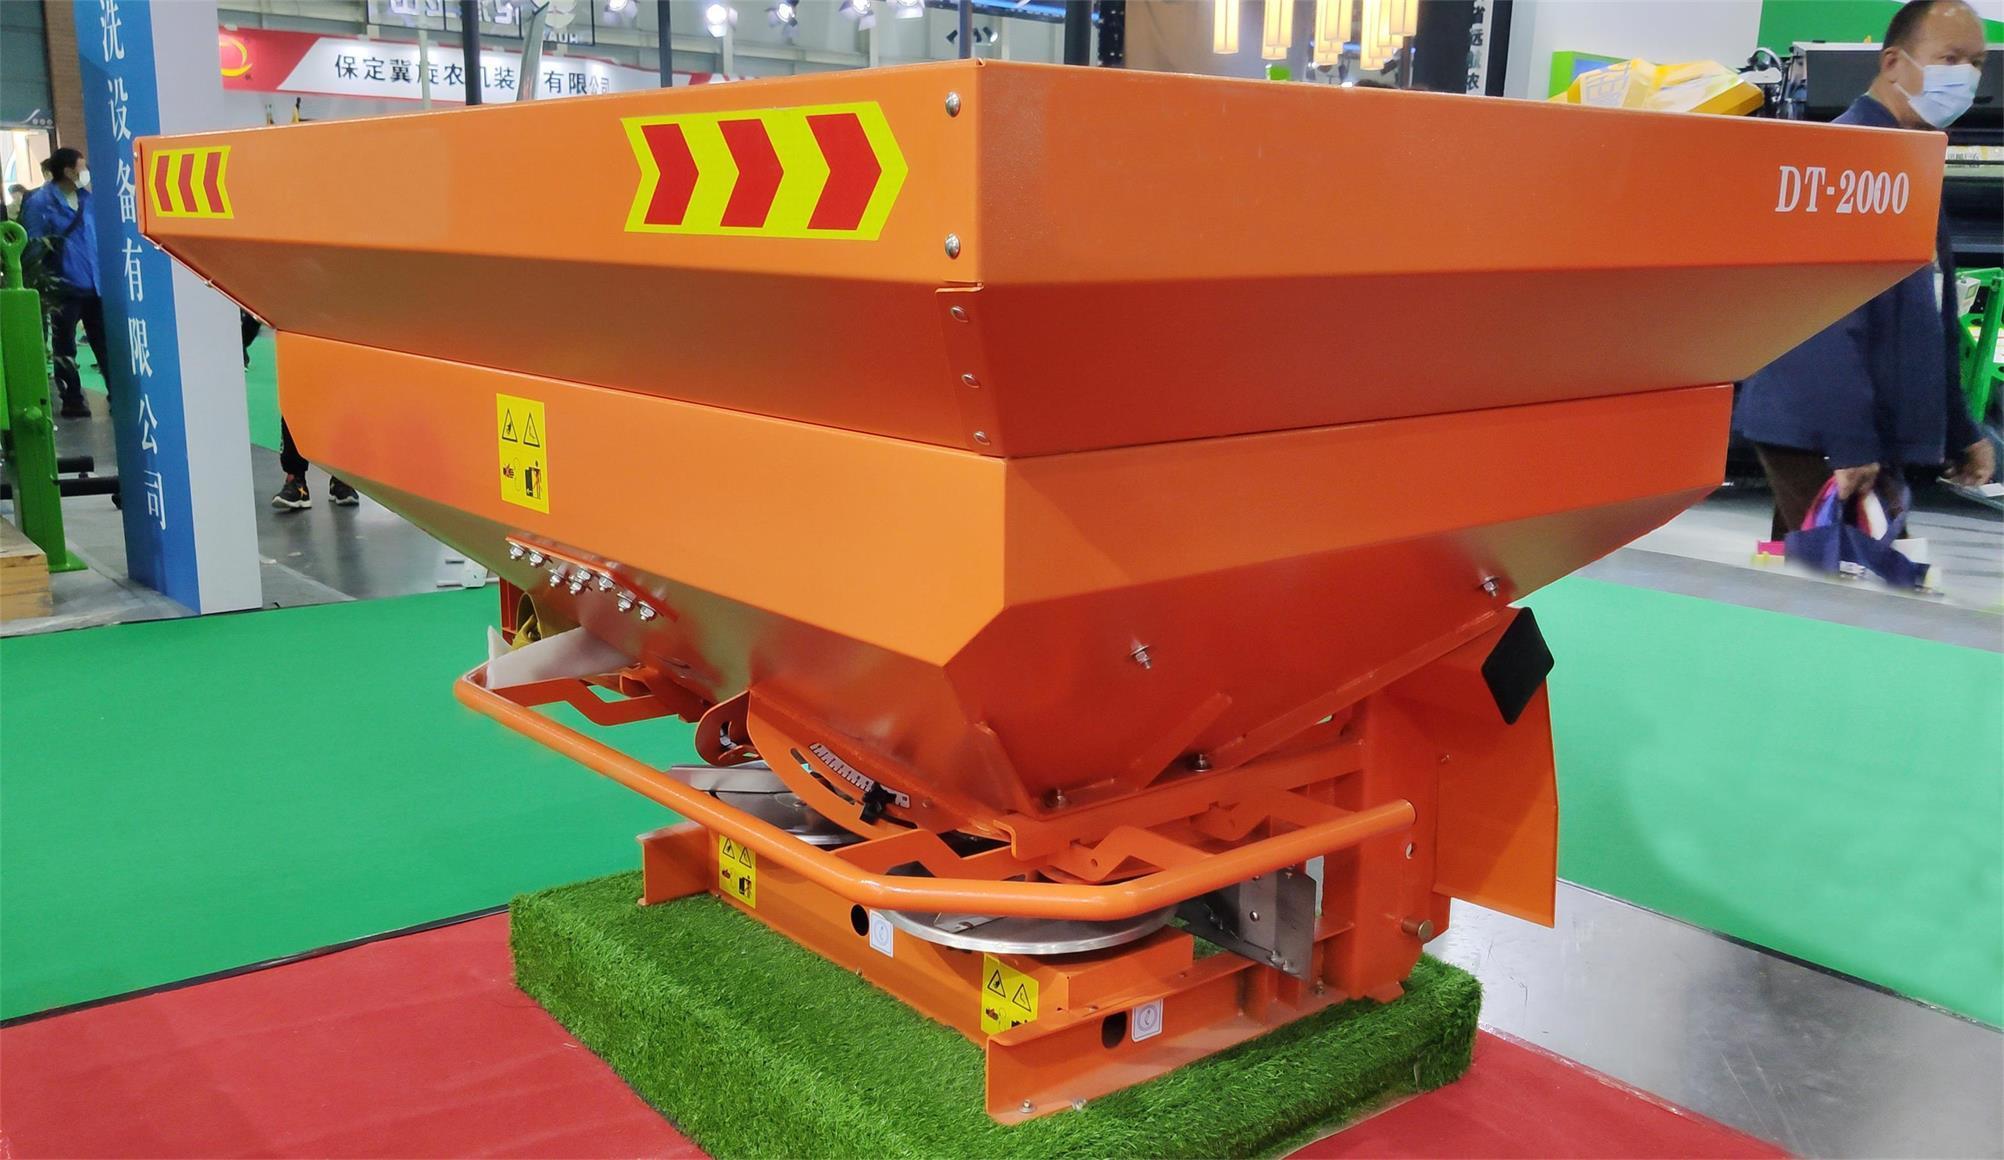 PTO driven double disc fertilizer spreader